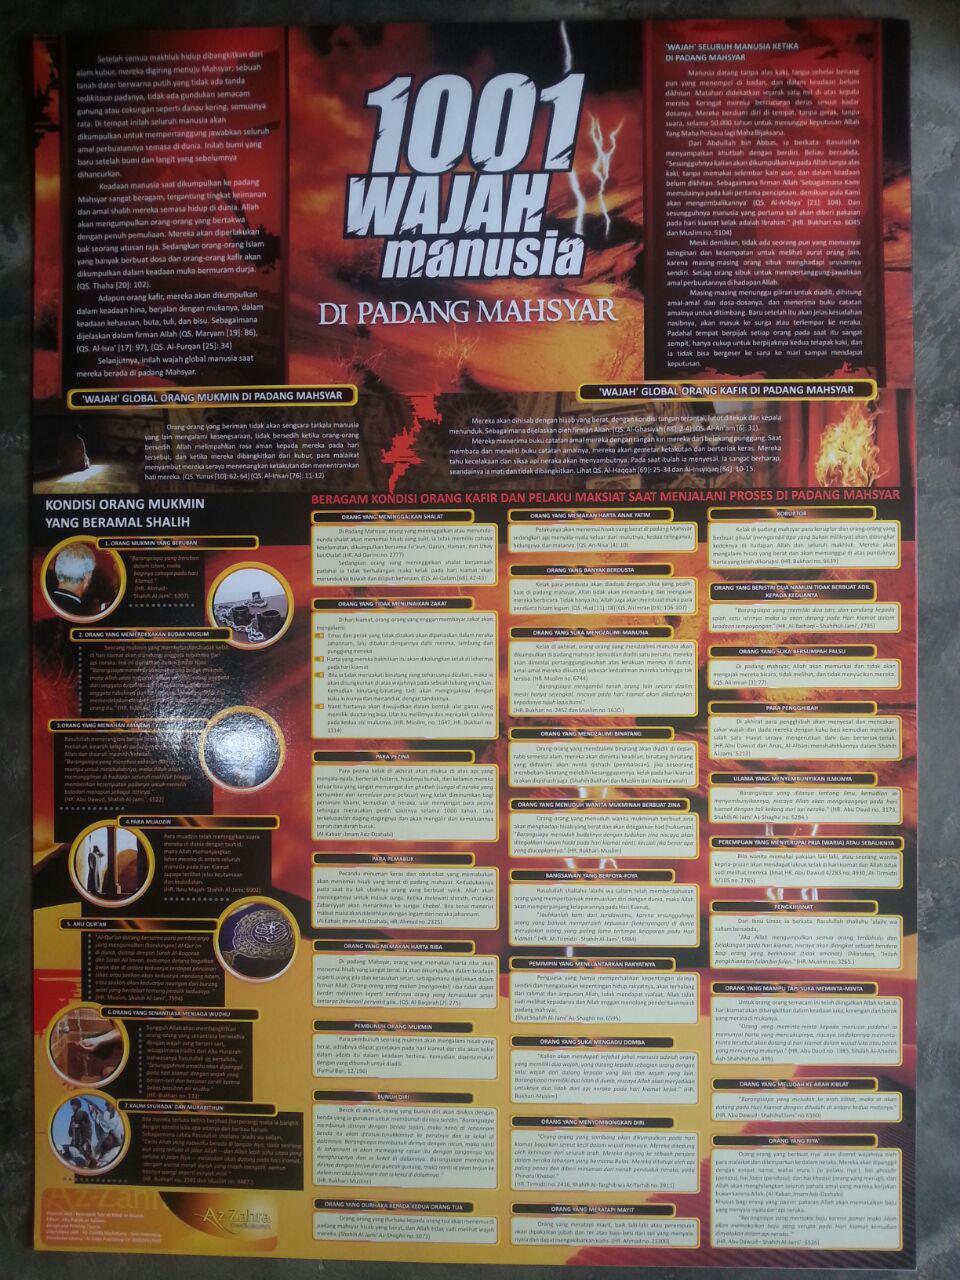 Poster 1001 Wajah Manusia Di Padang Mahsyar 3